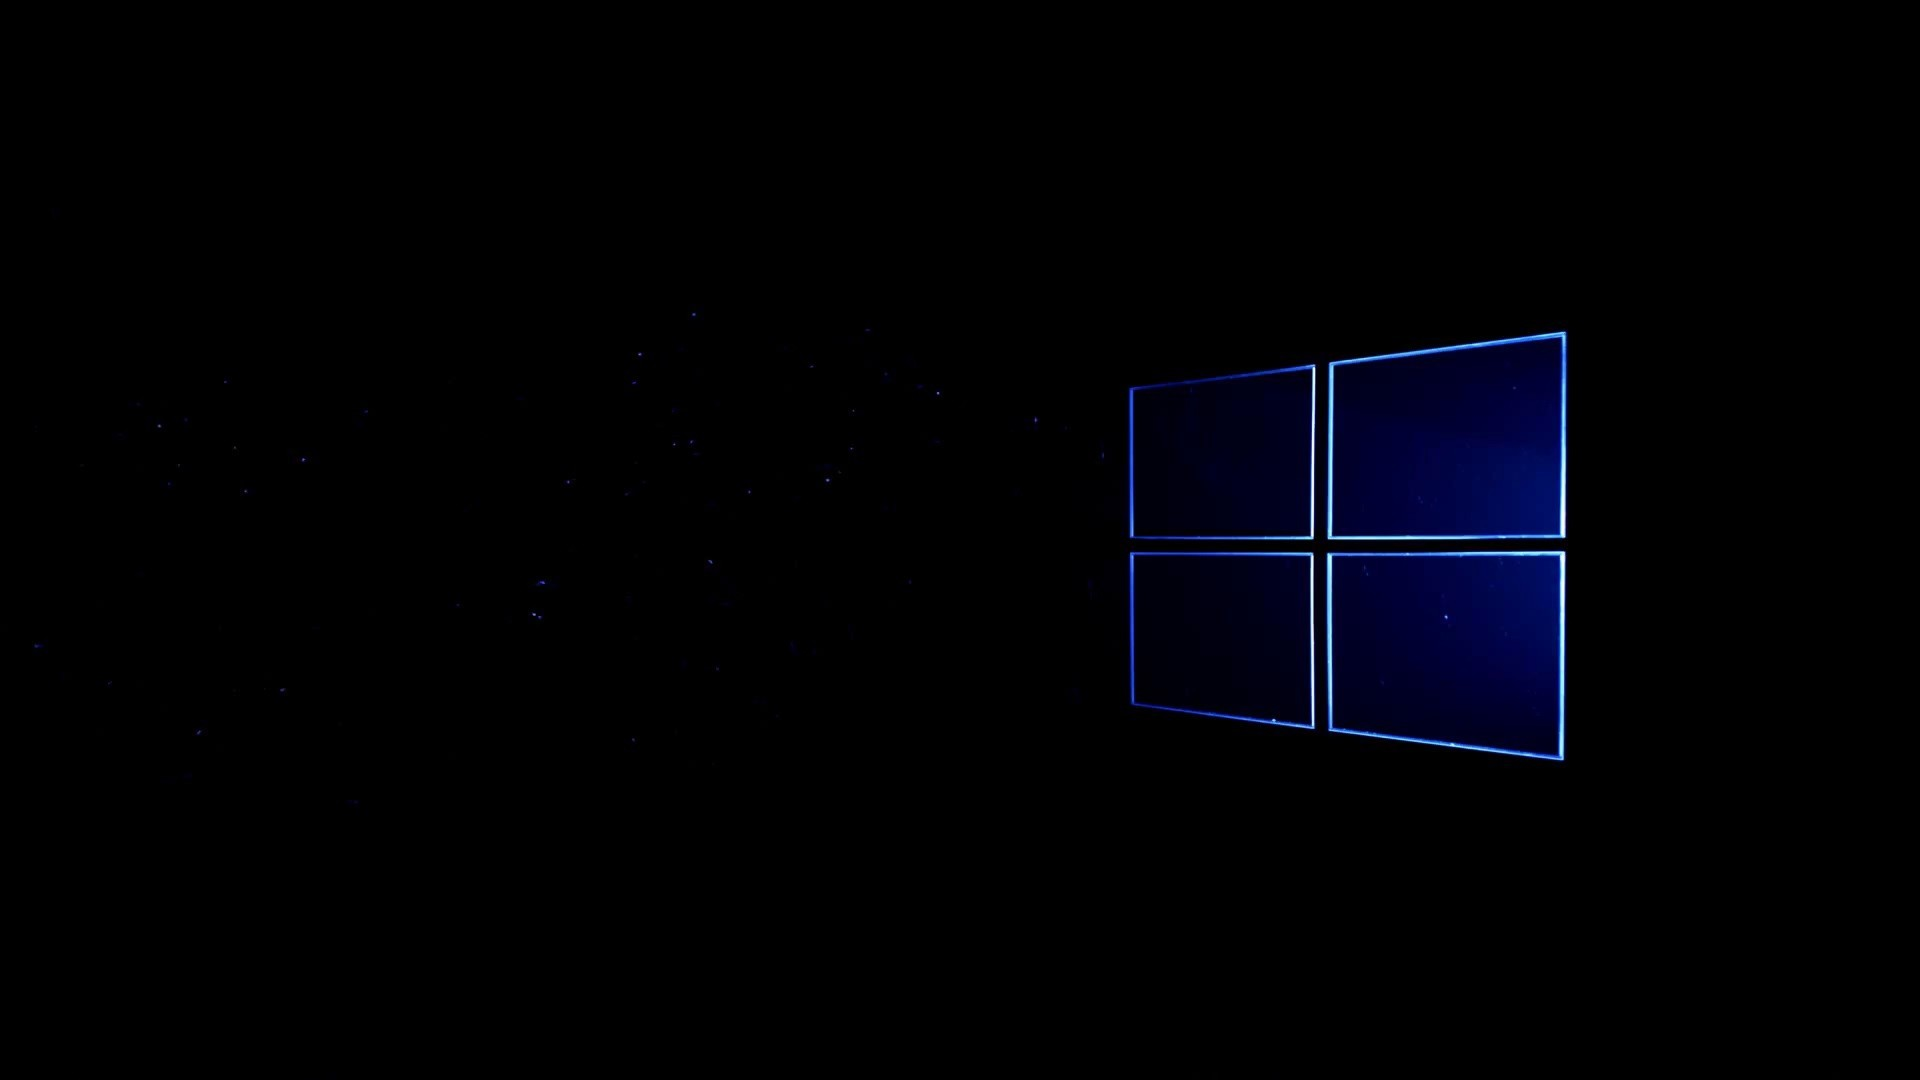 Microsoft Wallpaper HD